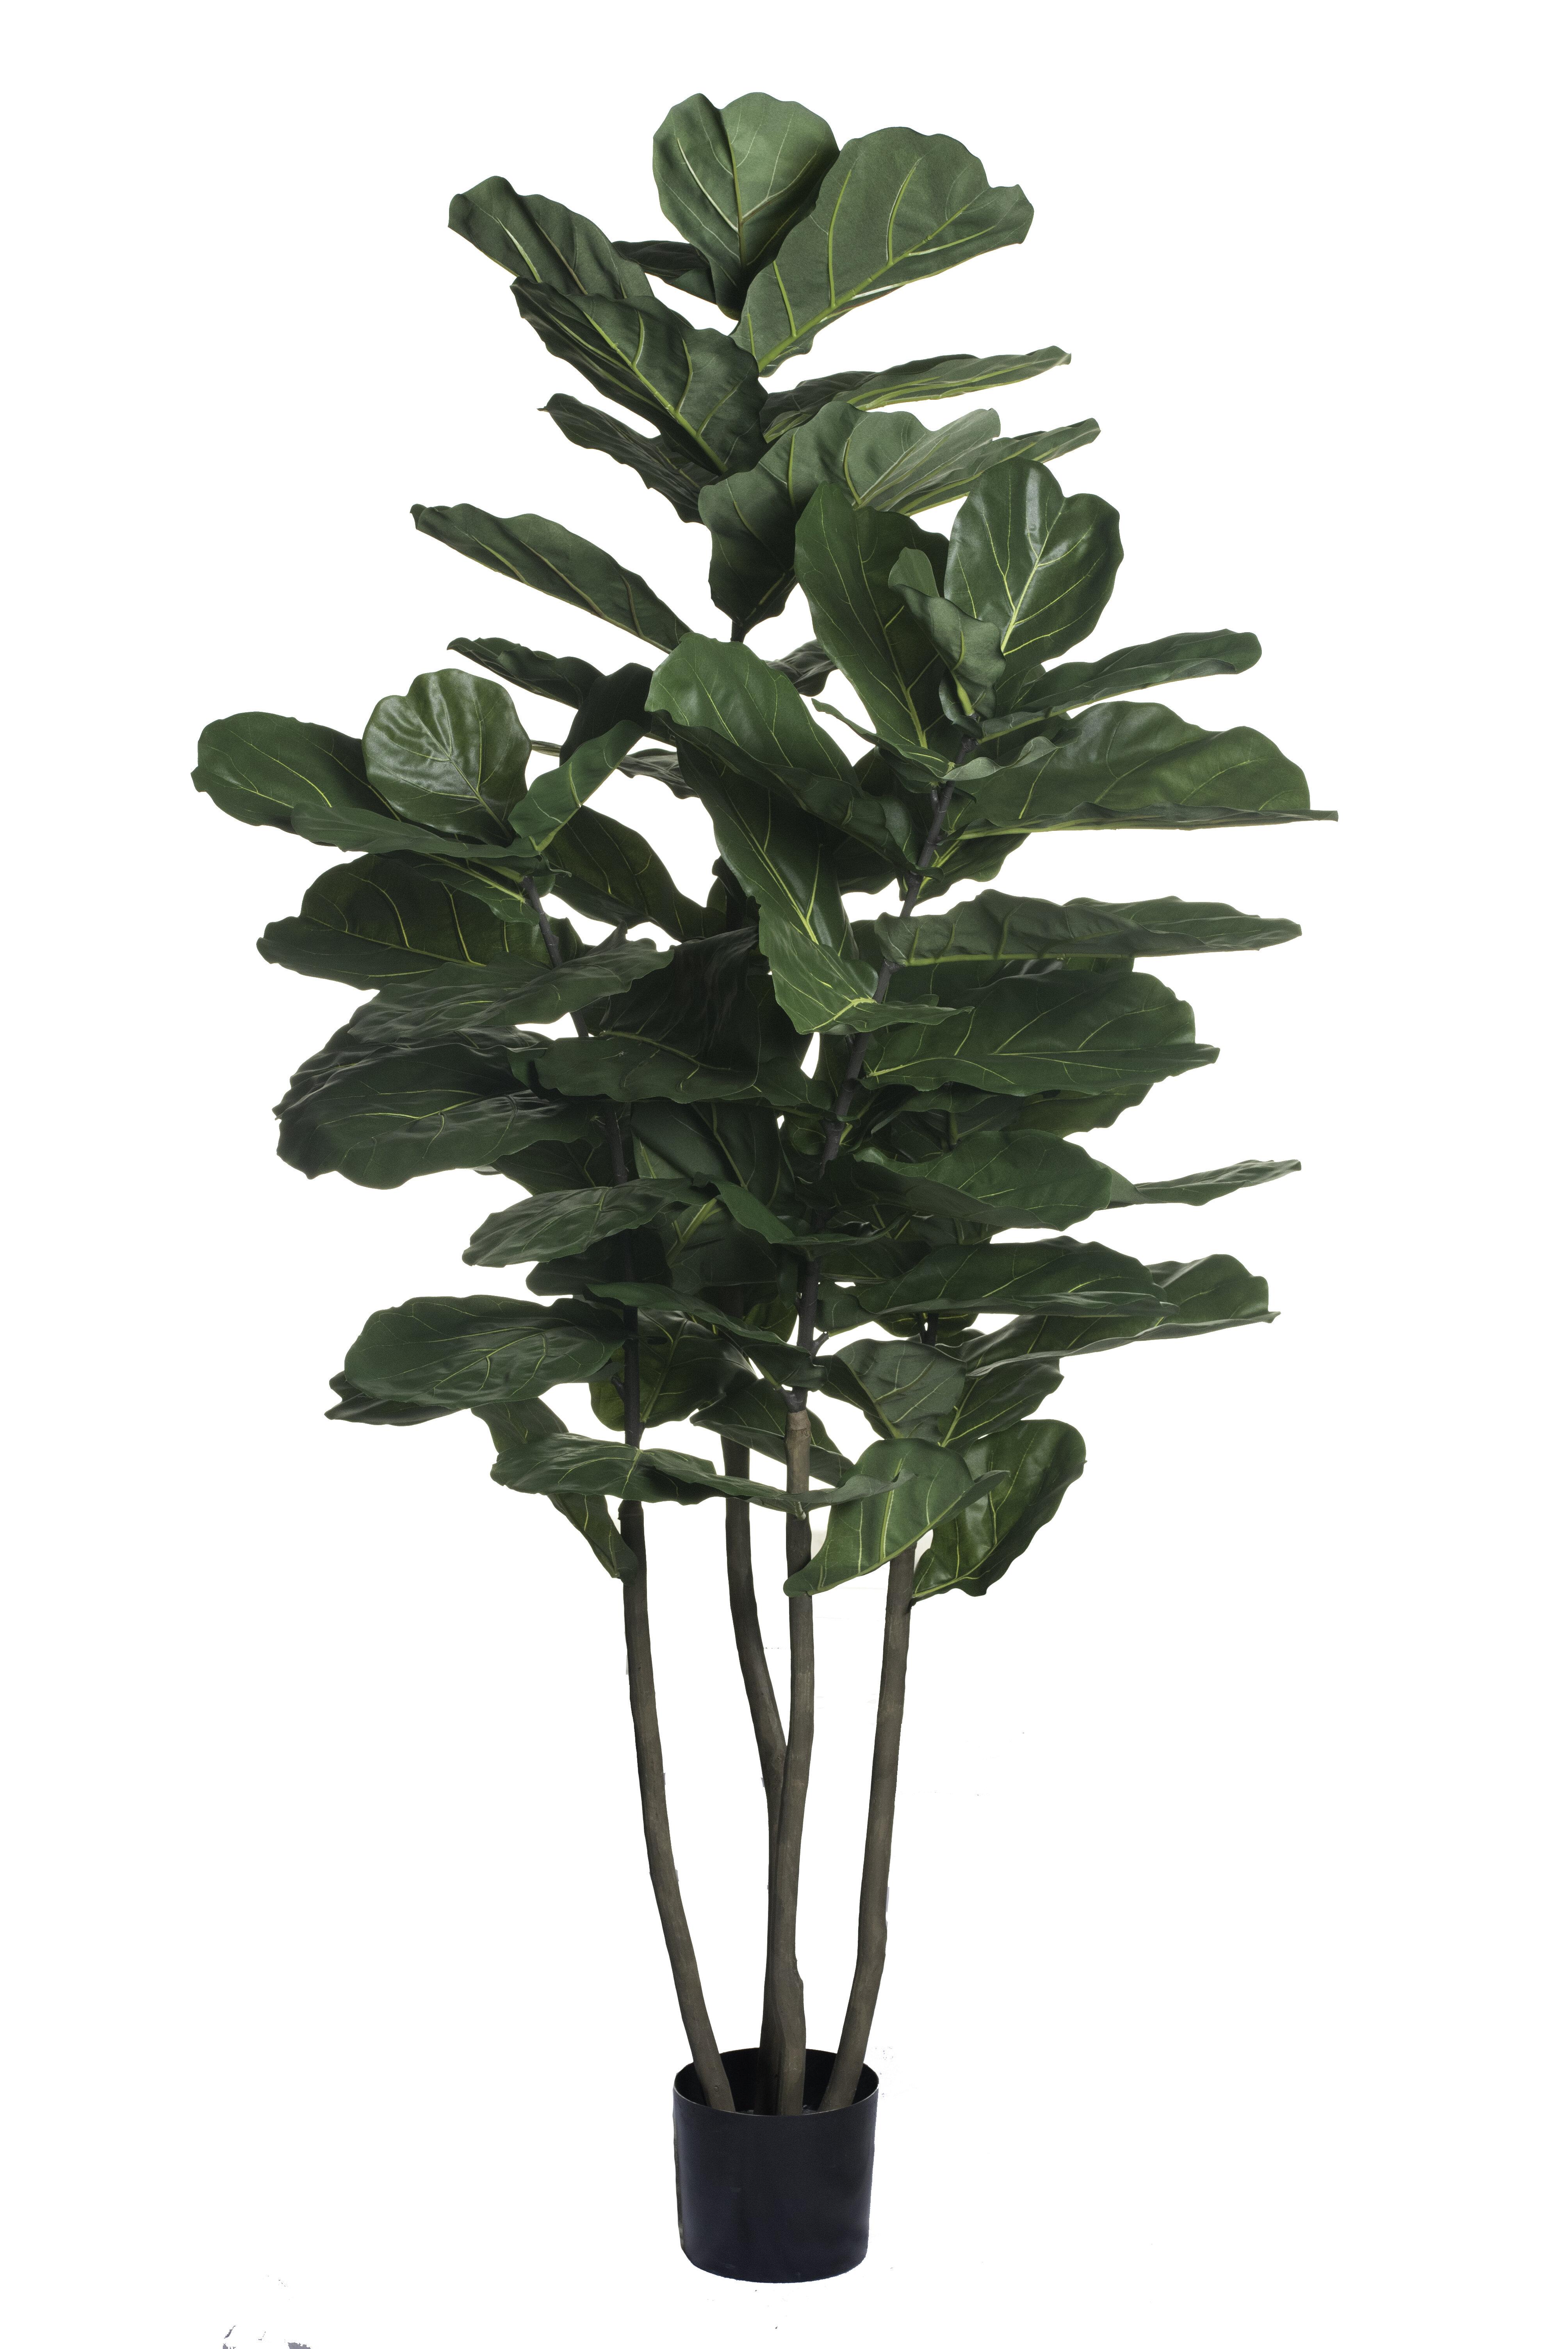 84 Artificial Fiddle Leaf Fig Tree In Pot Liner Reviews Birch Lane